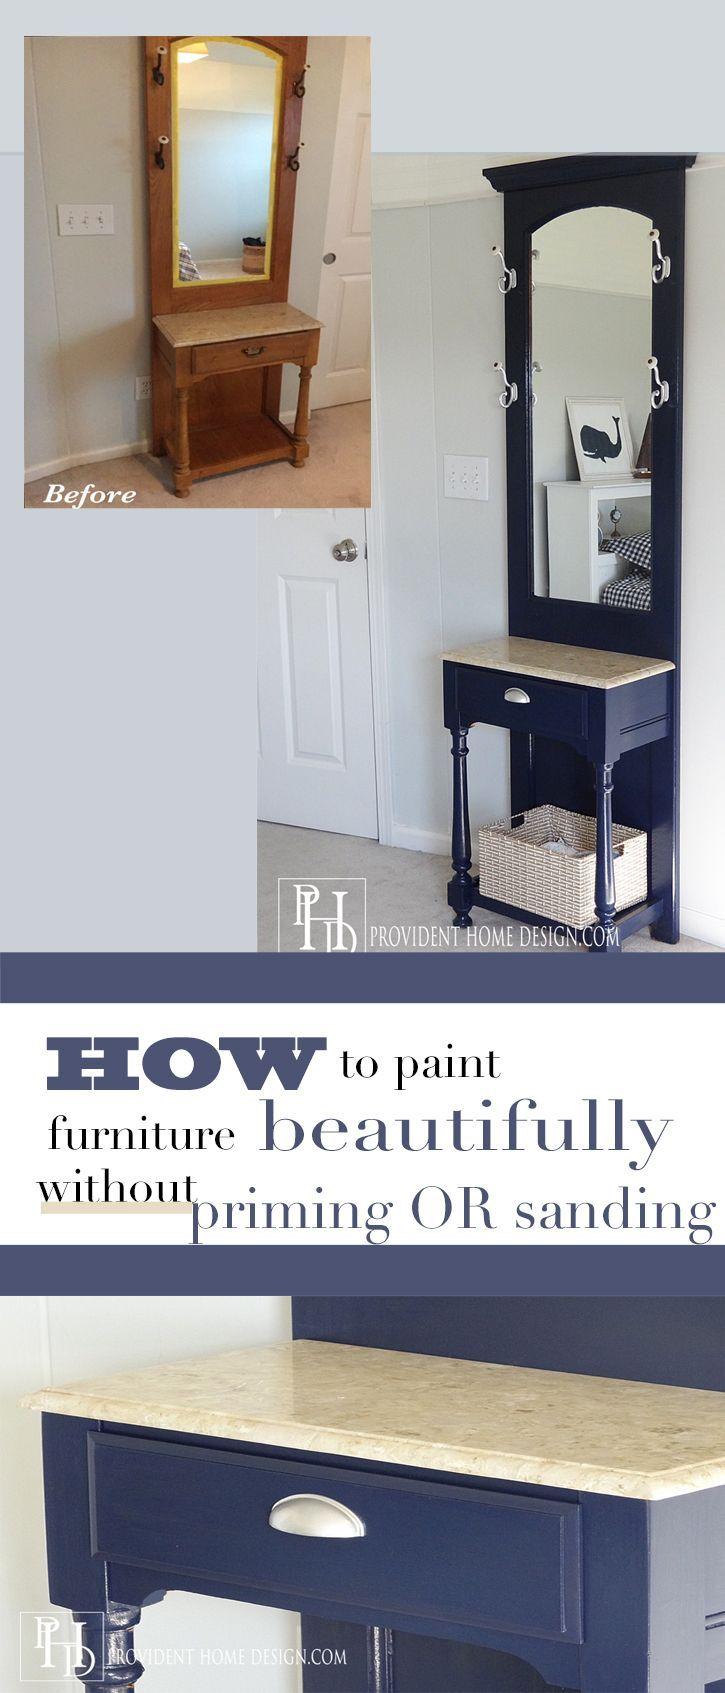 495 best FURNITURE MAKEOVERS images on Pinterest   Furniture  Furniture  ideas and Painted furniture. 495 best FURNITURE MAKEOVERS images on Pinterest   Furniture